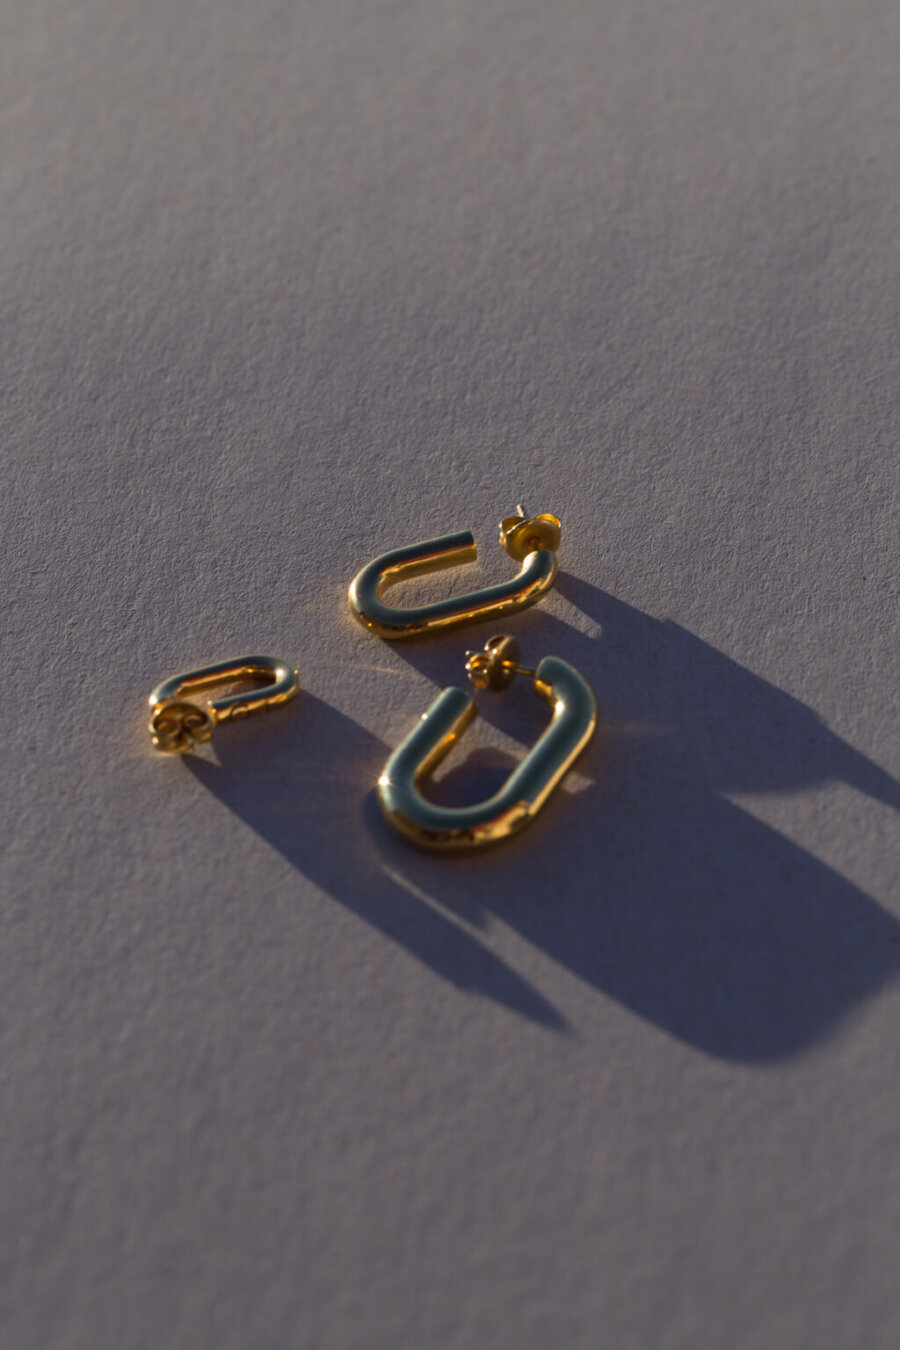 the-medium-golden-link-earring-by-glenda-lopez-alta